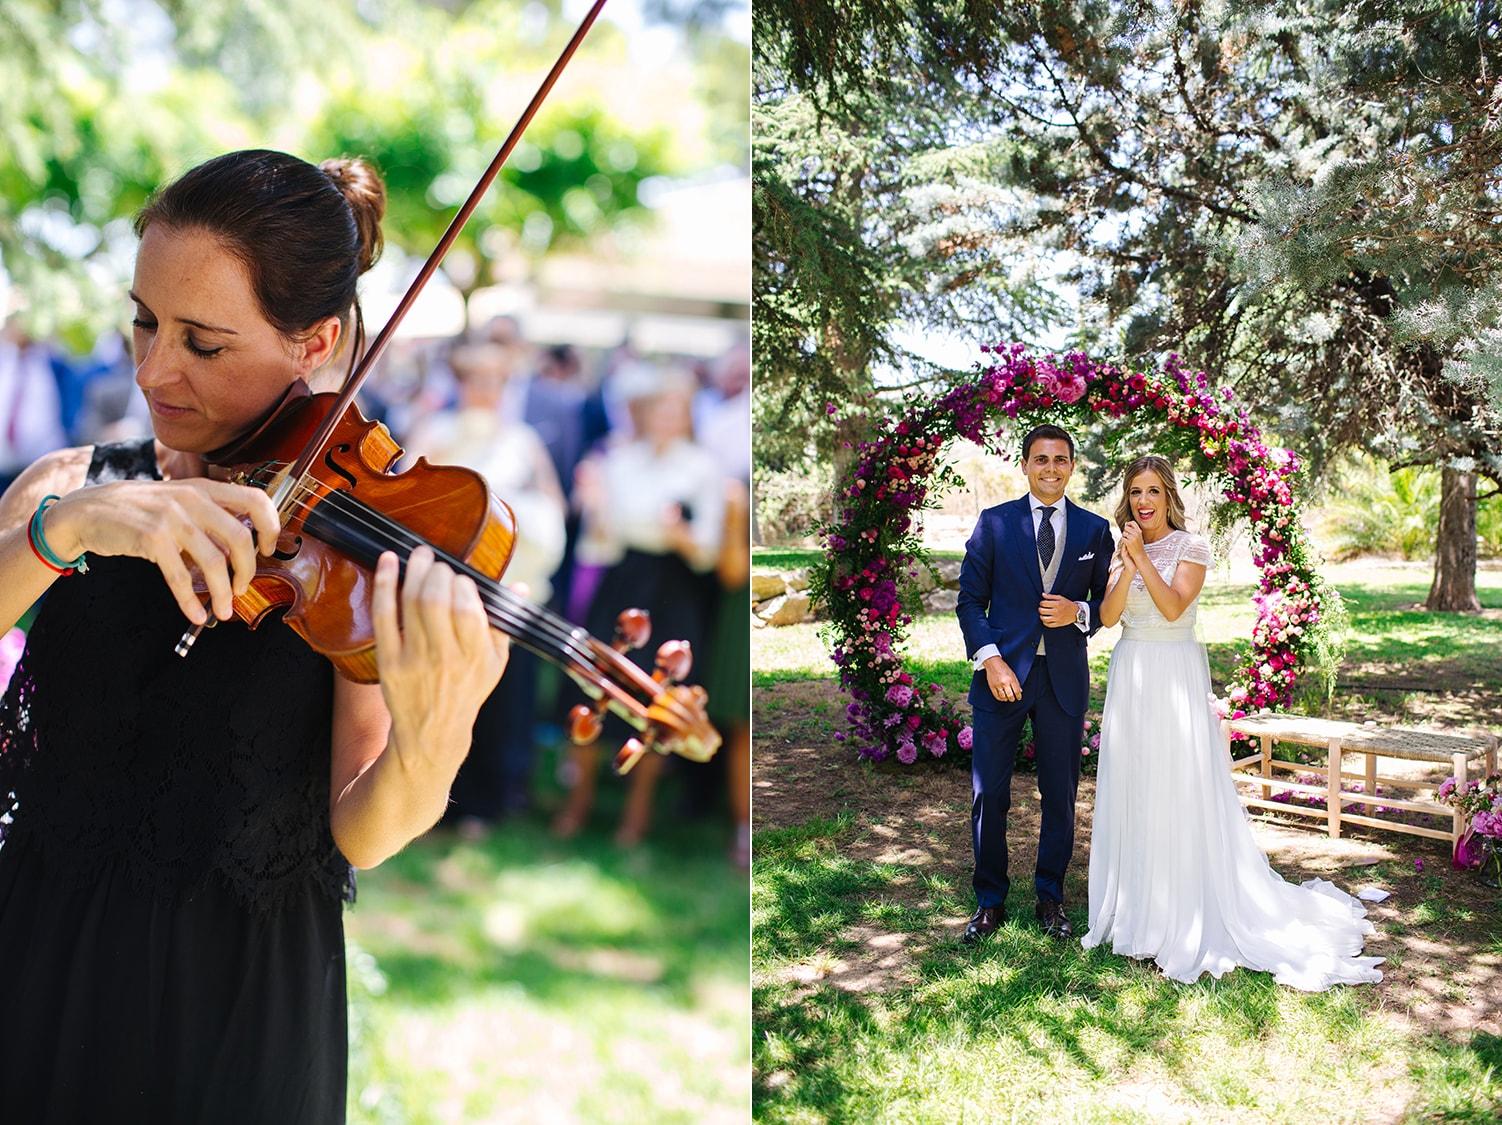 paulagfurio_bouganvillea_wedding_spain_031.jpg